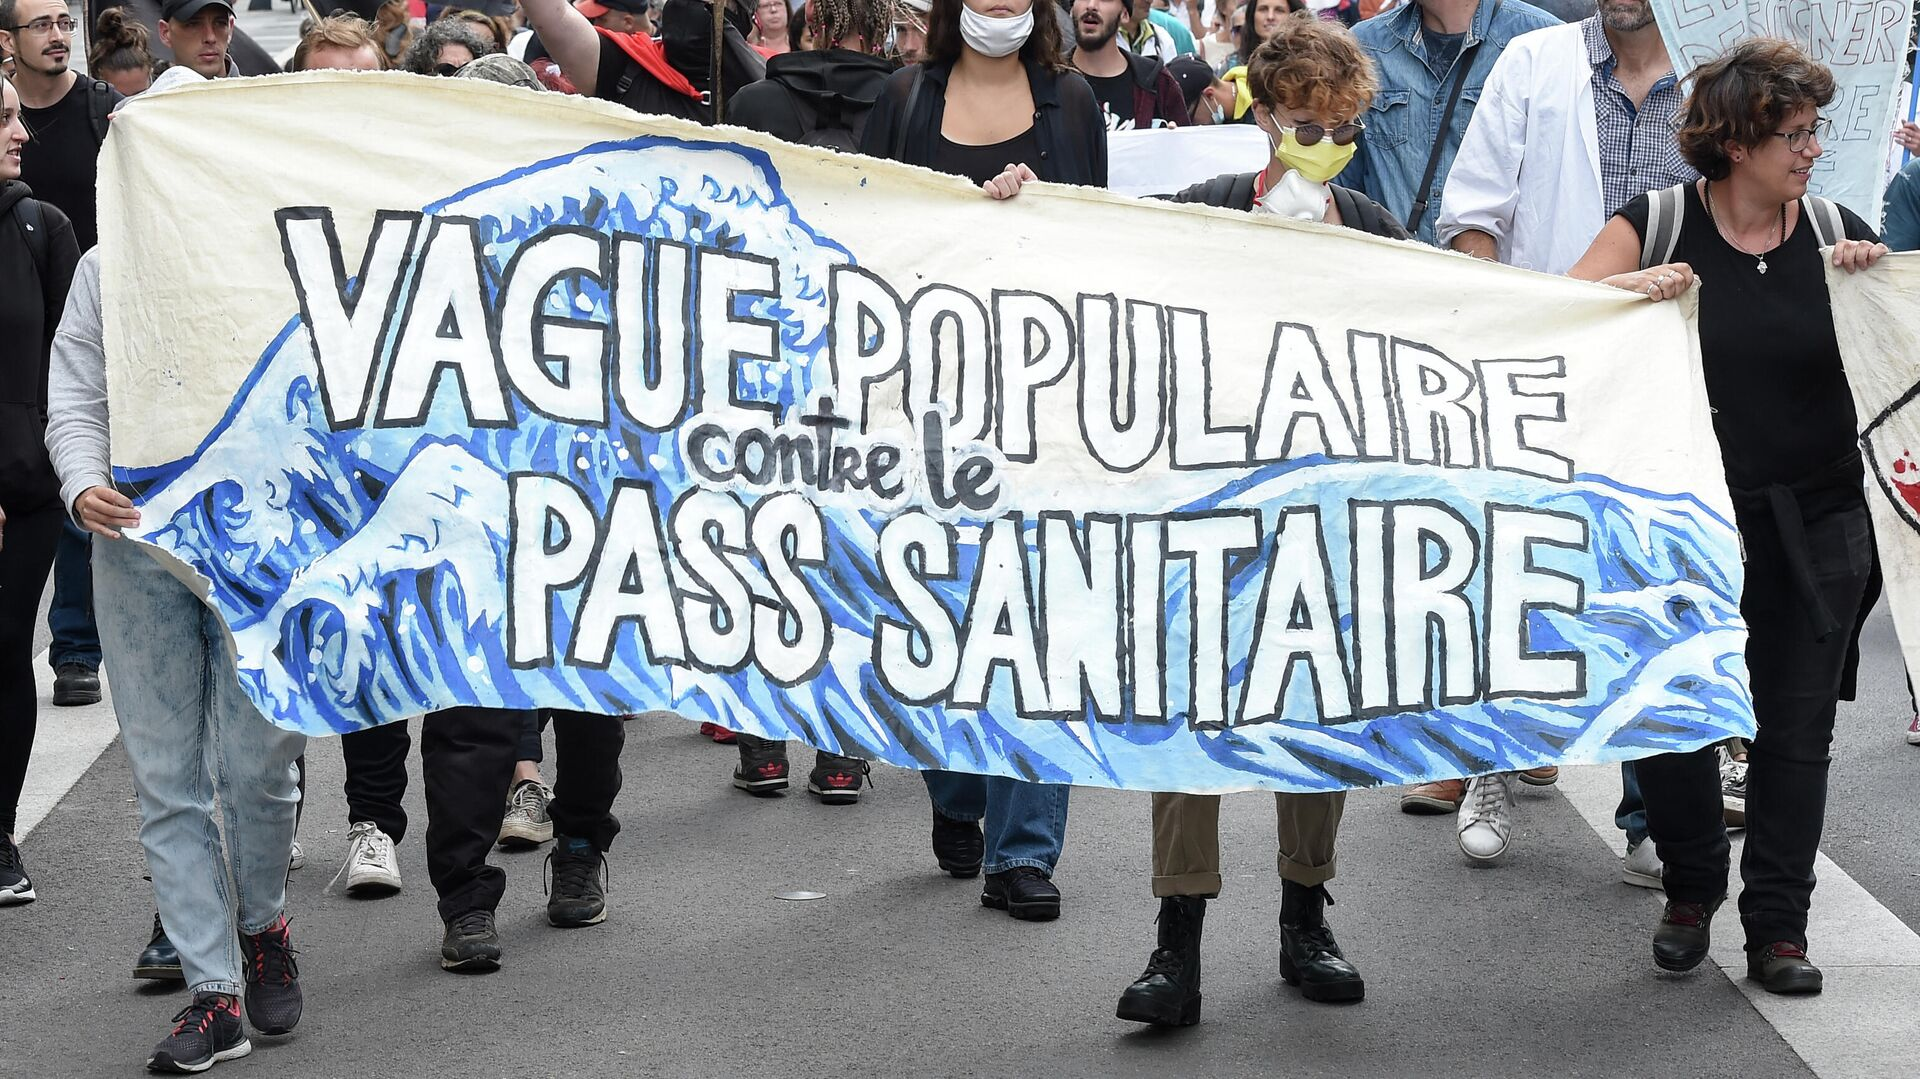 Manifestation anti pass sanitaire - Sputnik France, 1920, 22.09.2021